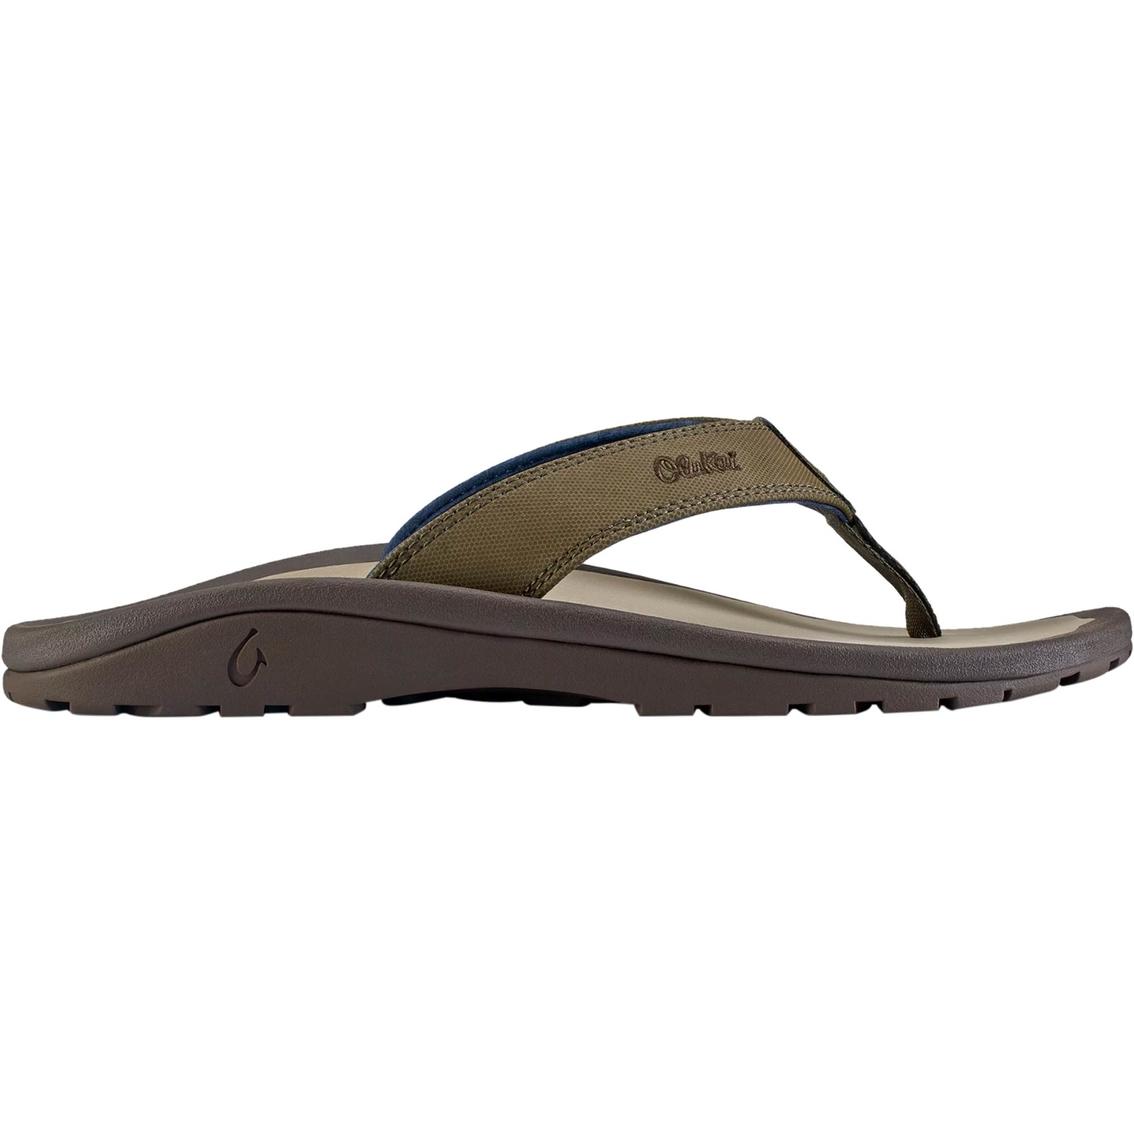 Olukai Men's Ohana Sandals | Sandals